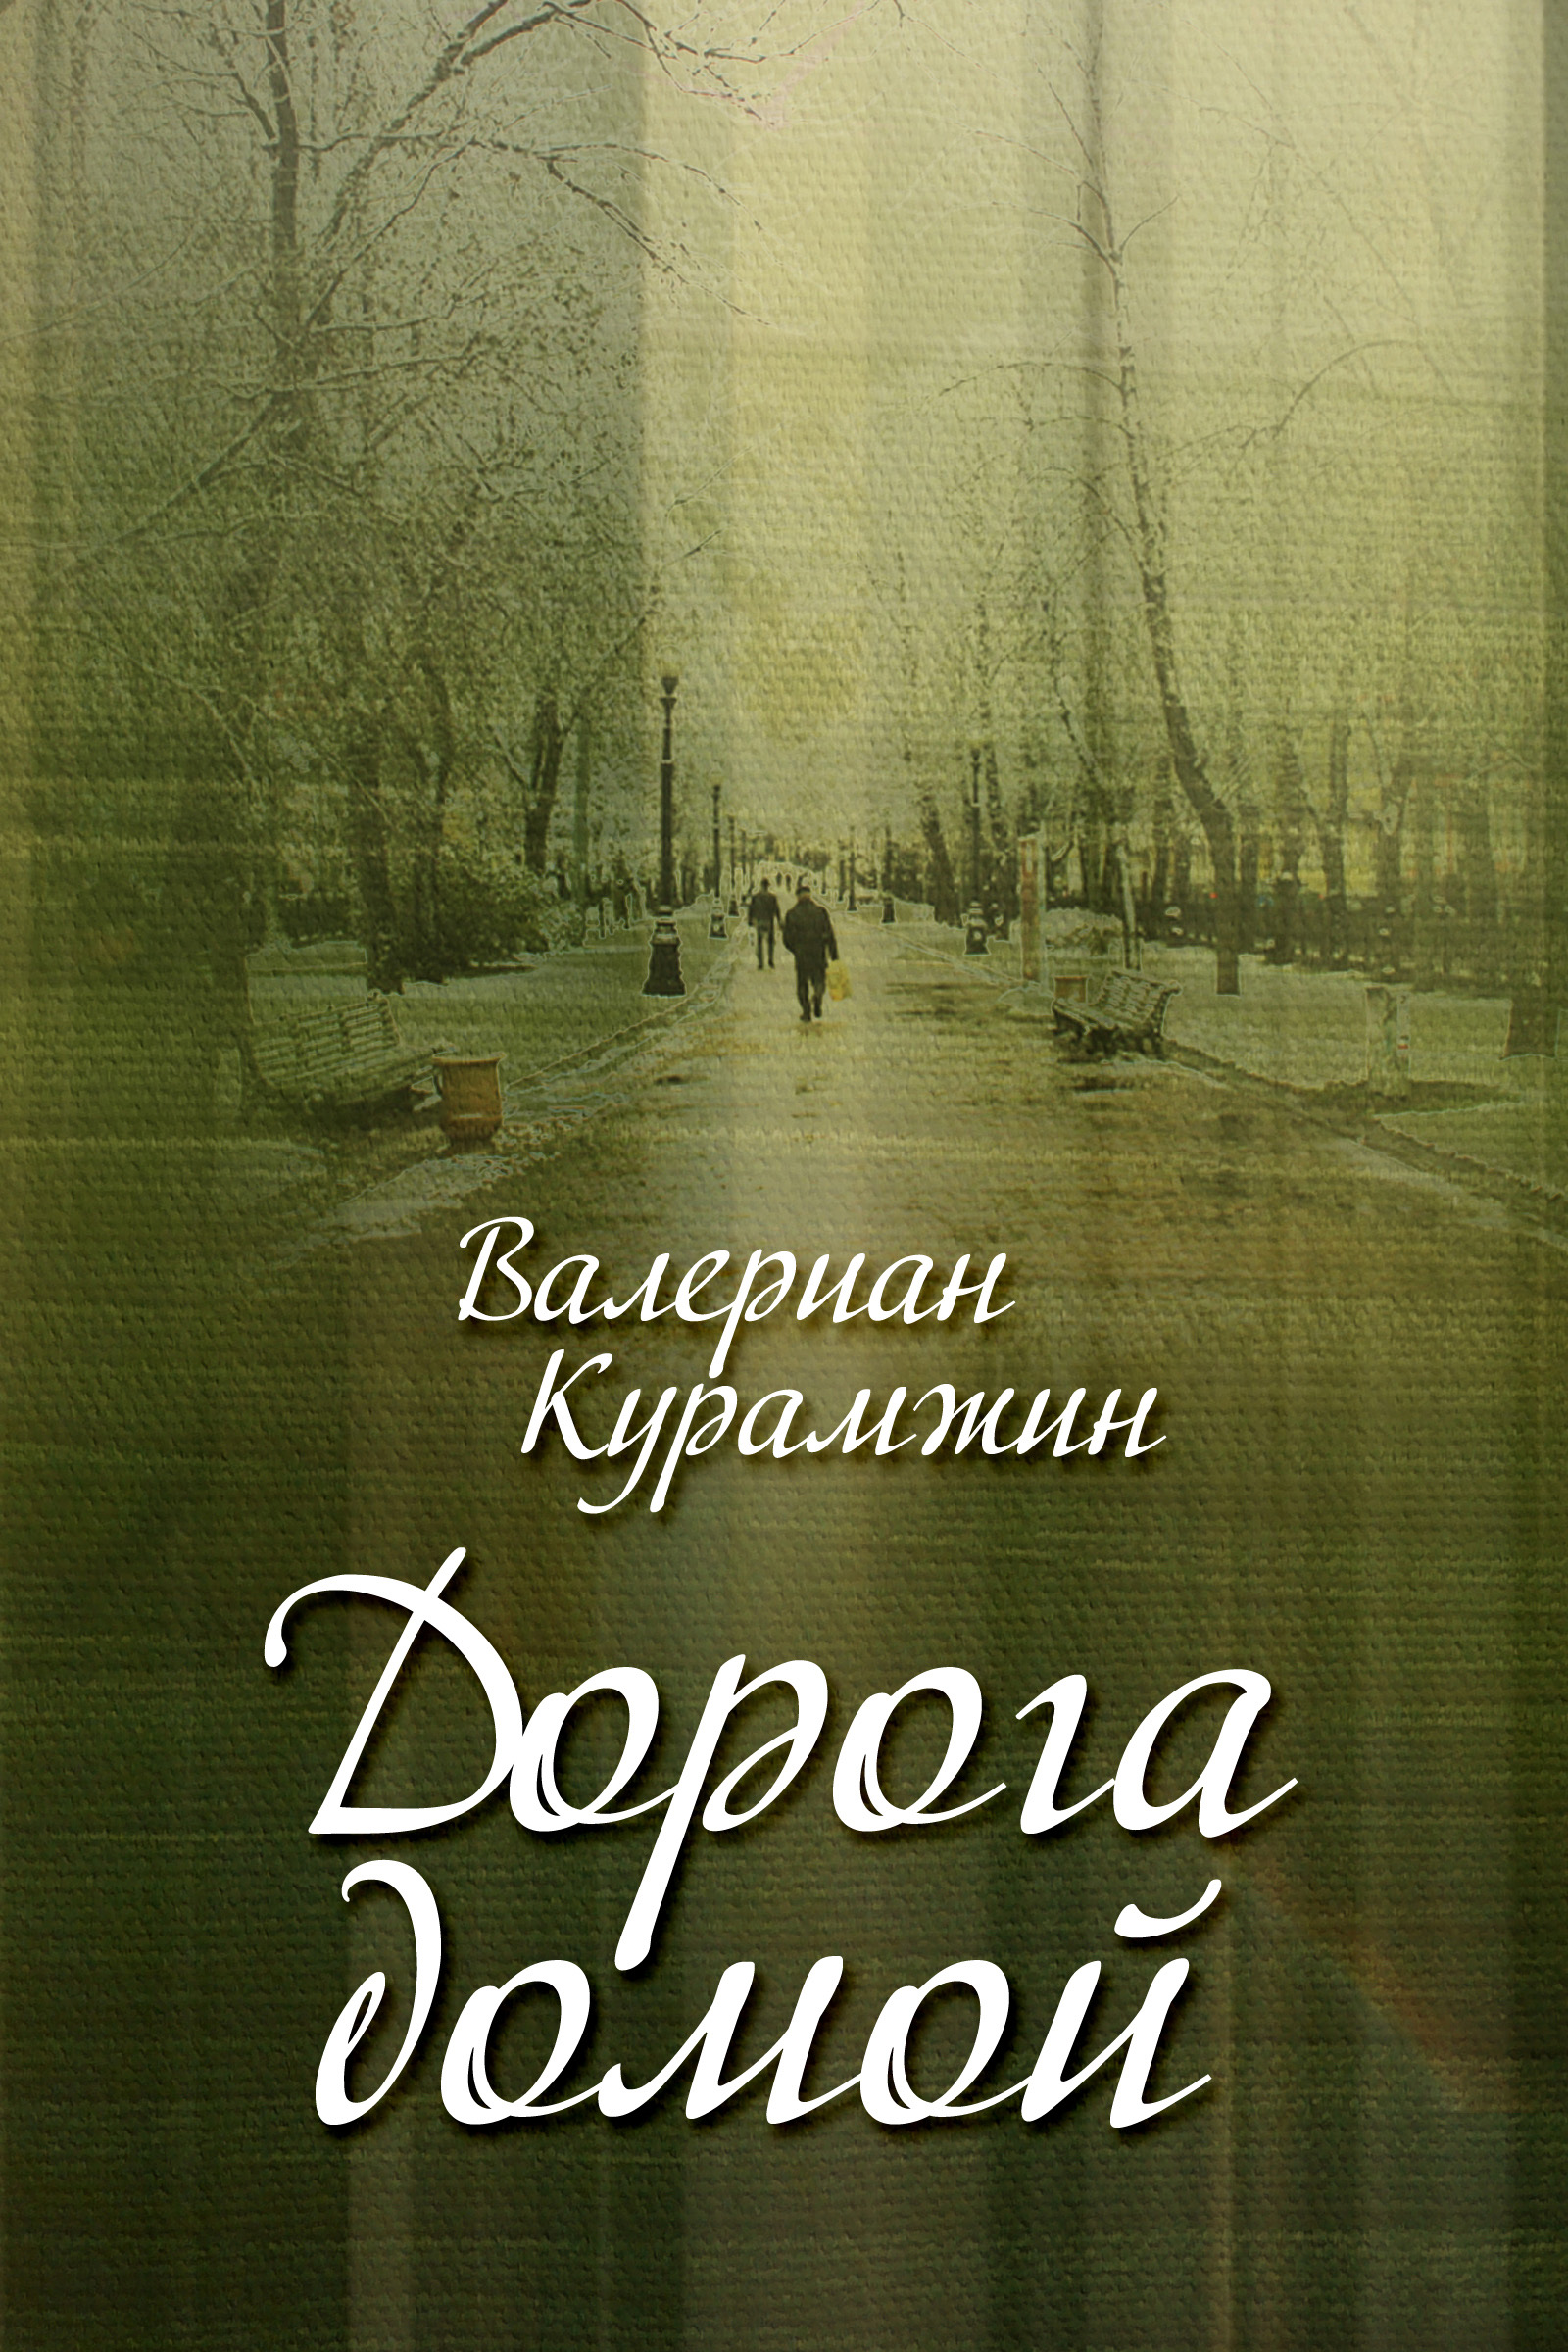 Валериан Курамжин Дорога домой (сборник) антон ковалев дорога домой